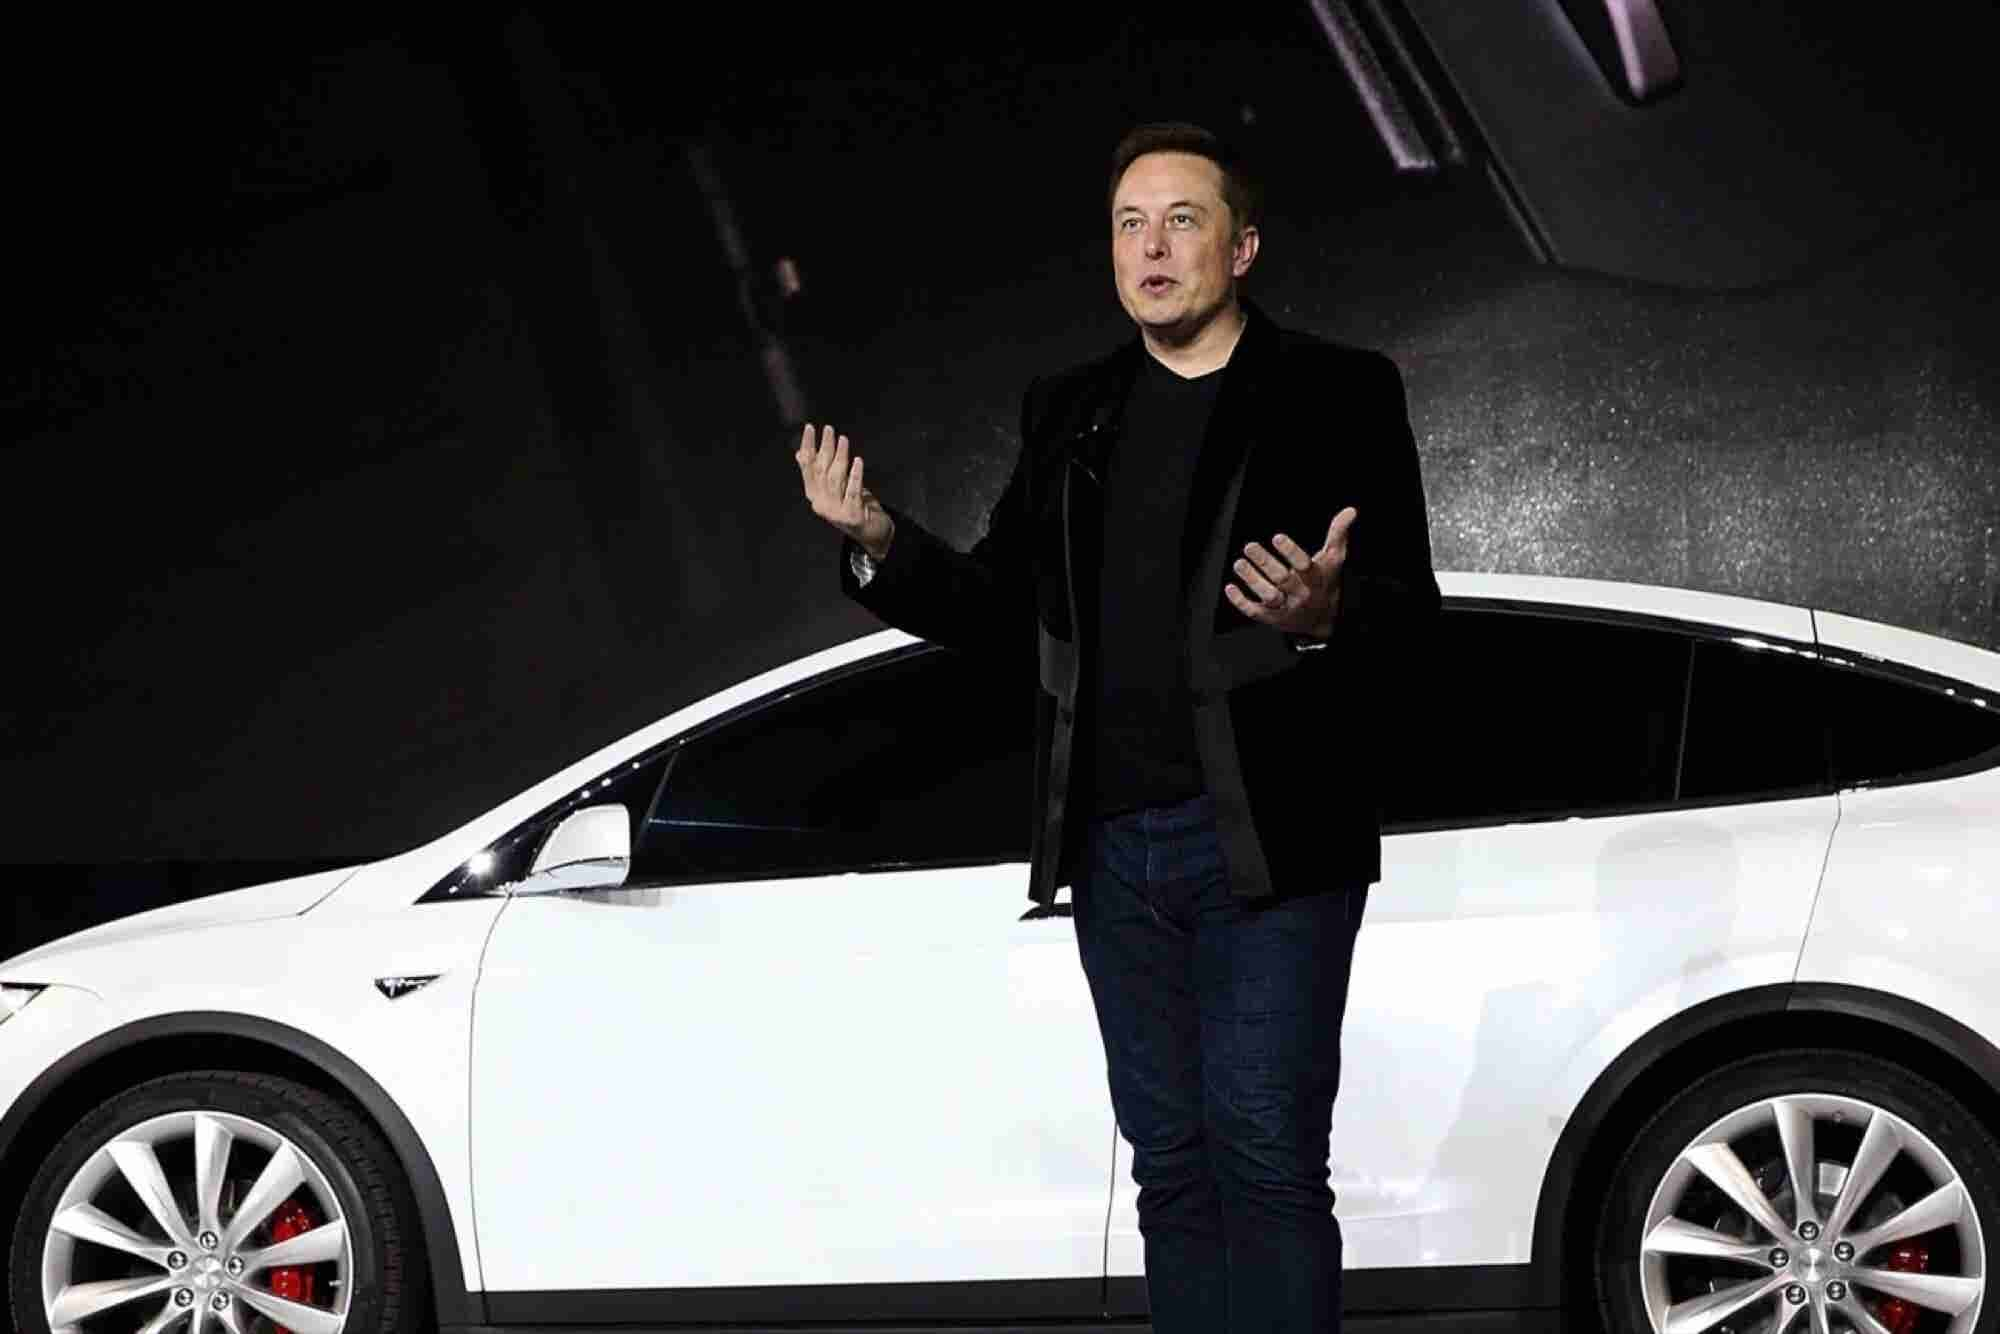 5 Habits That Made Elon Musk an Innovator